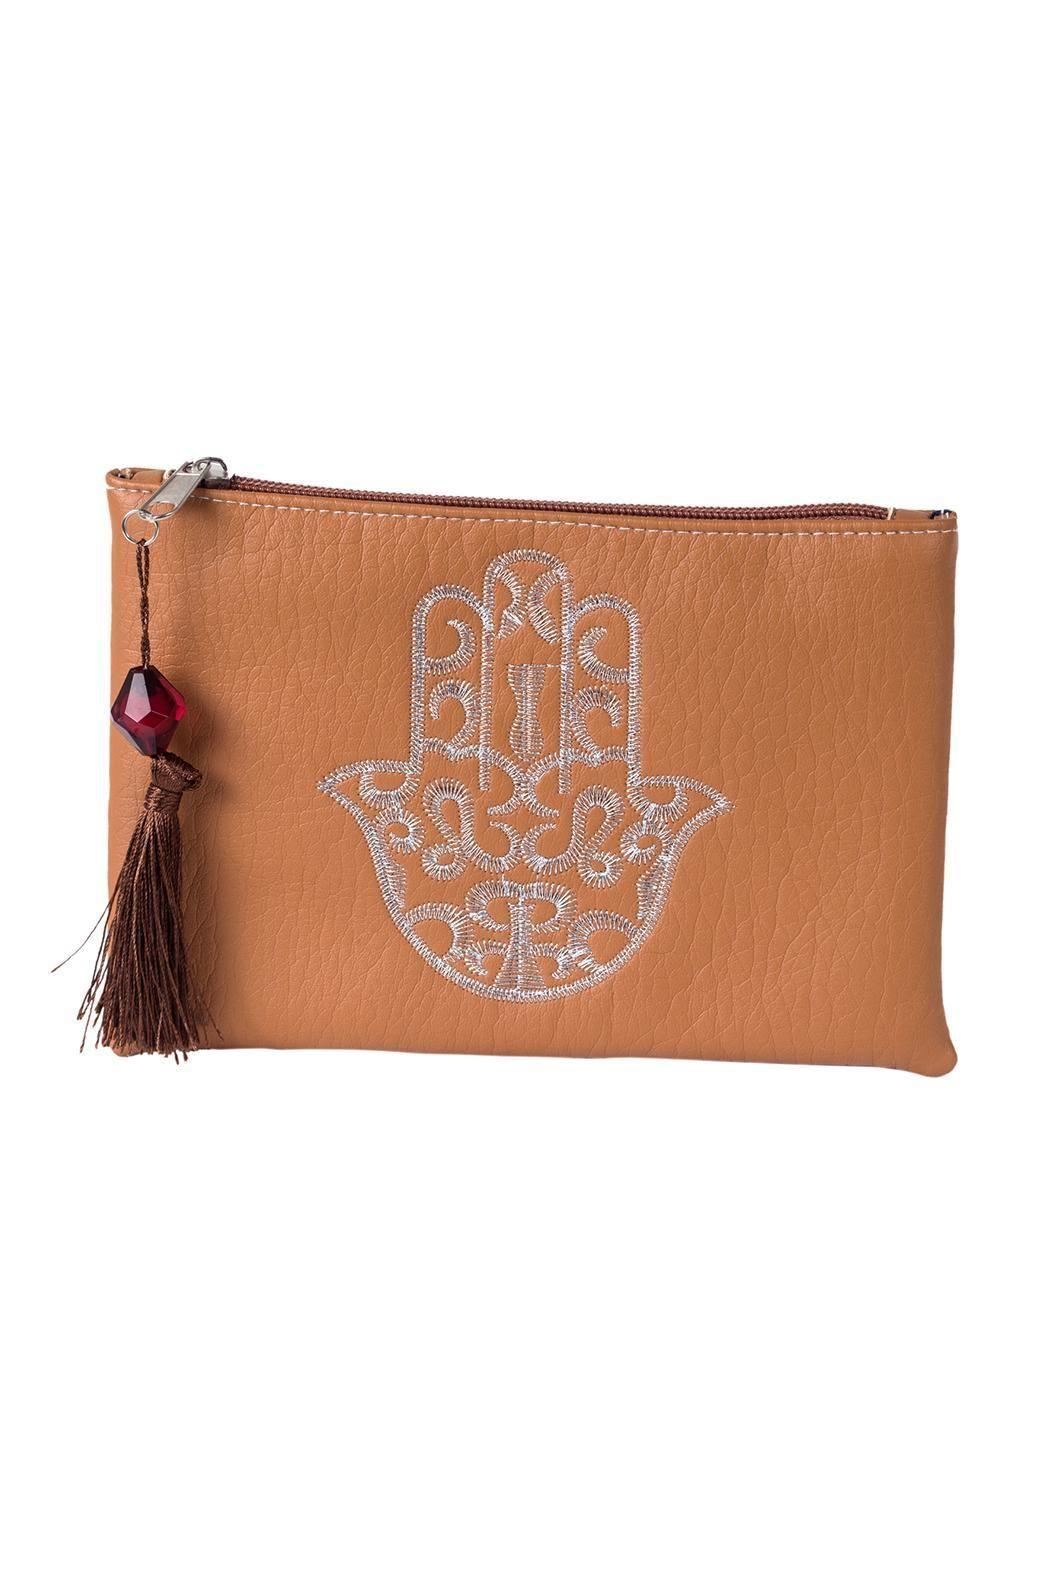 "Ideal medium Hamsa embroidered clutch with a top tassel zipper closure.    Approx Measure: 7.5"" x 4.5"" x 1"".   Camel Hamsa Clutch  by Le Beau Maroc . Bags - Clutches - Casual Florida"